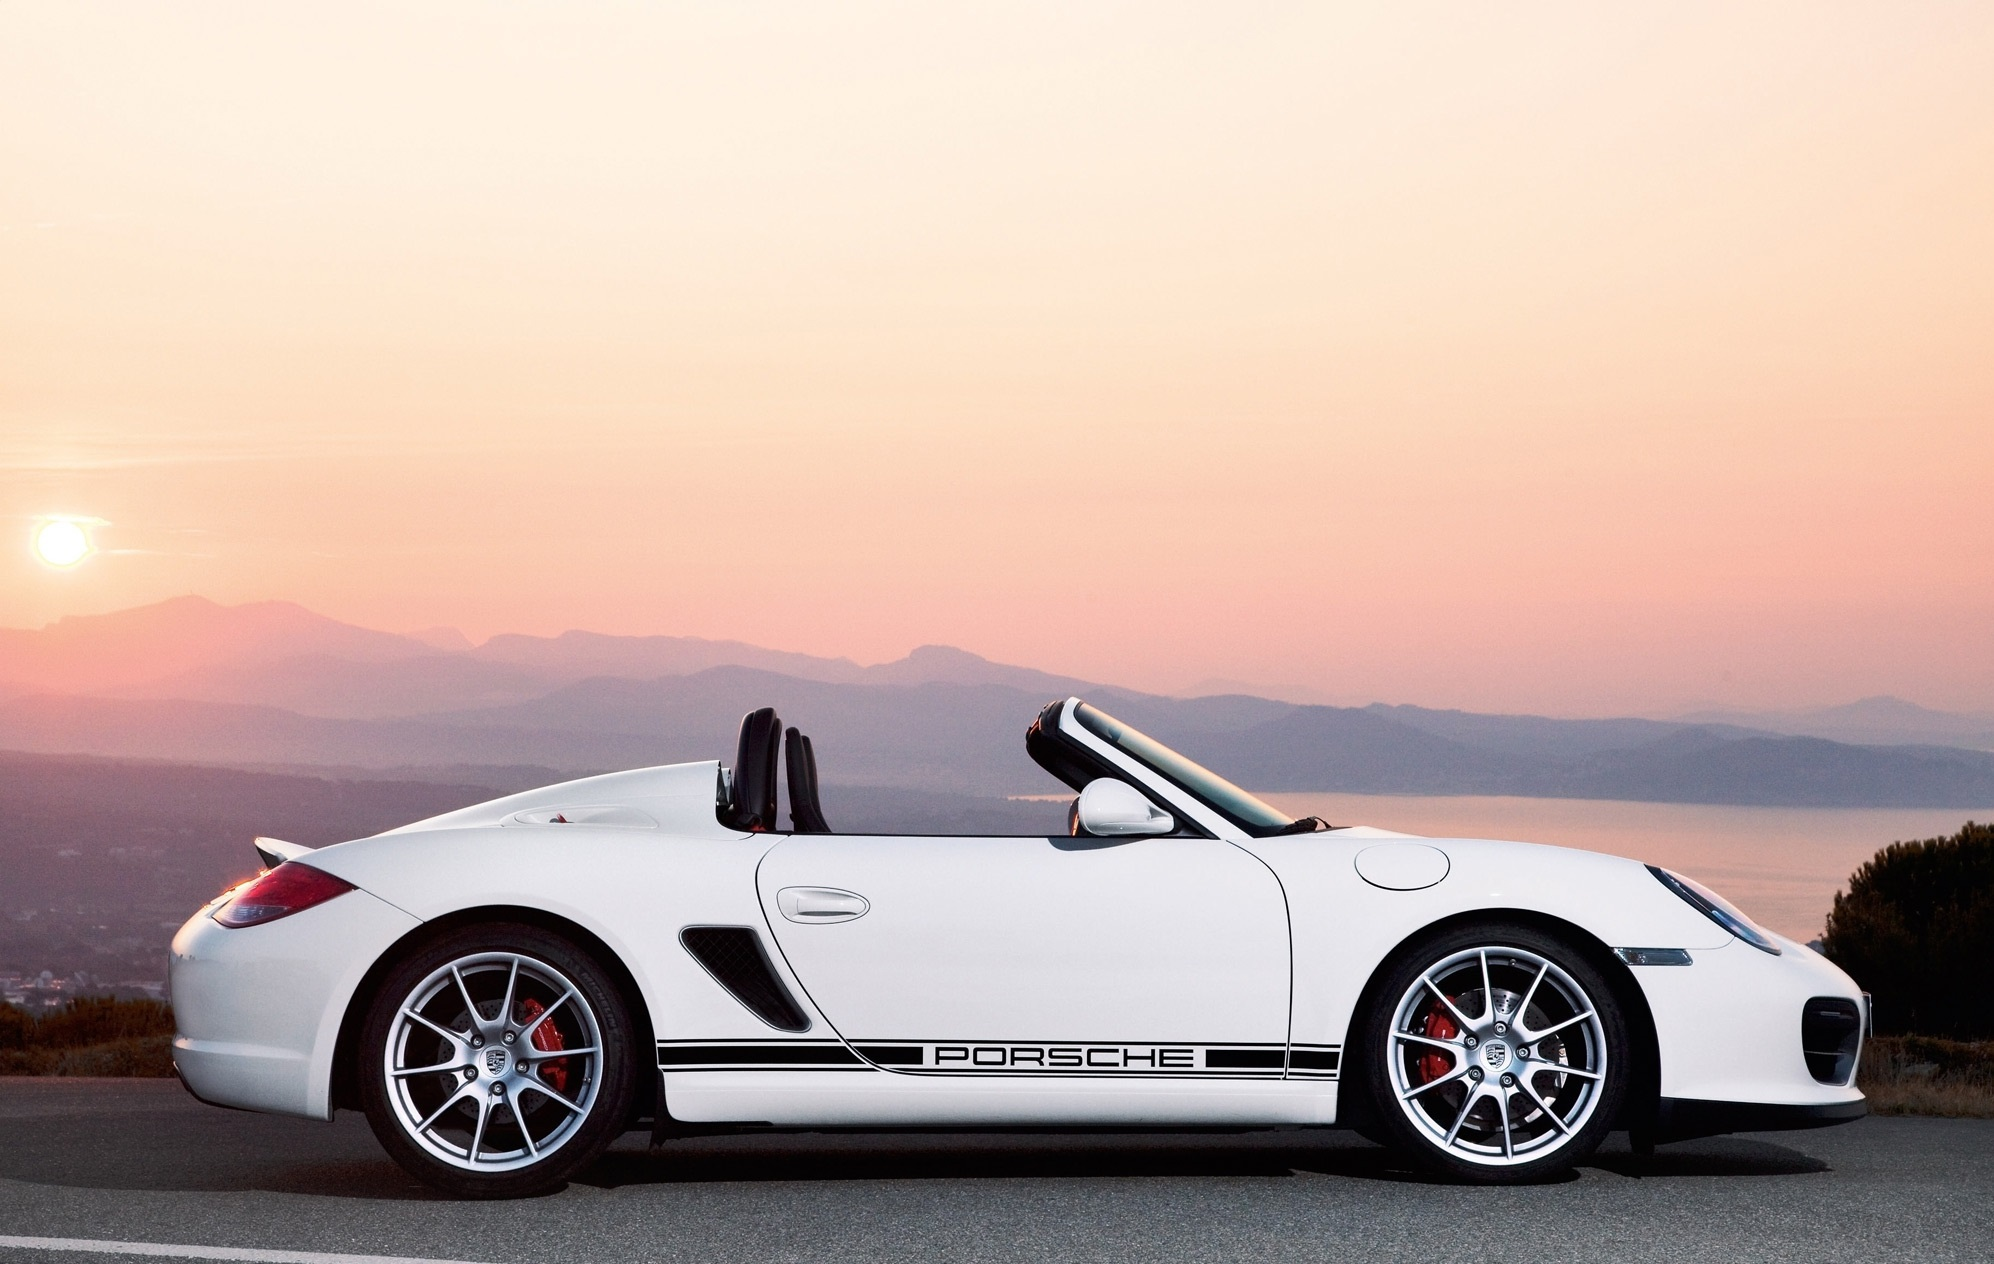 Porsche Boxster Spyder For Desktop